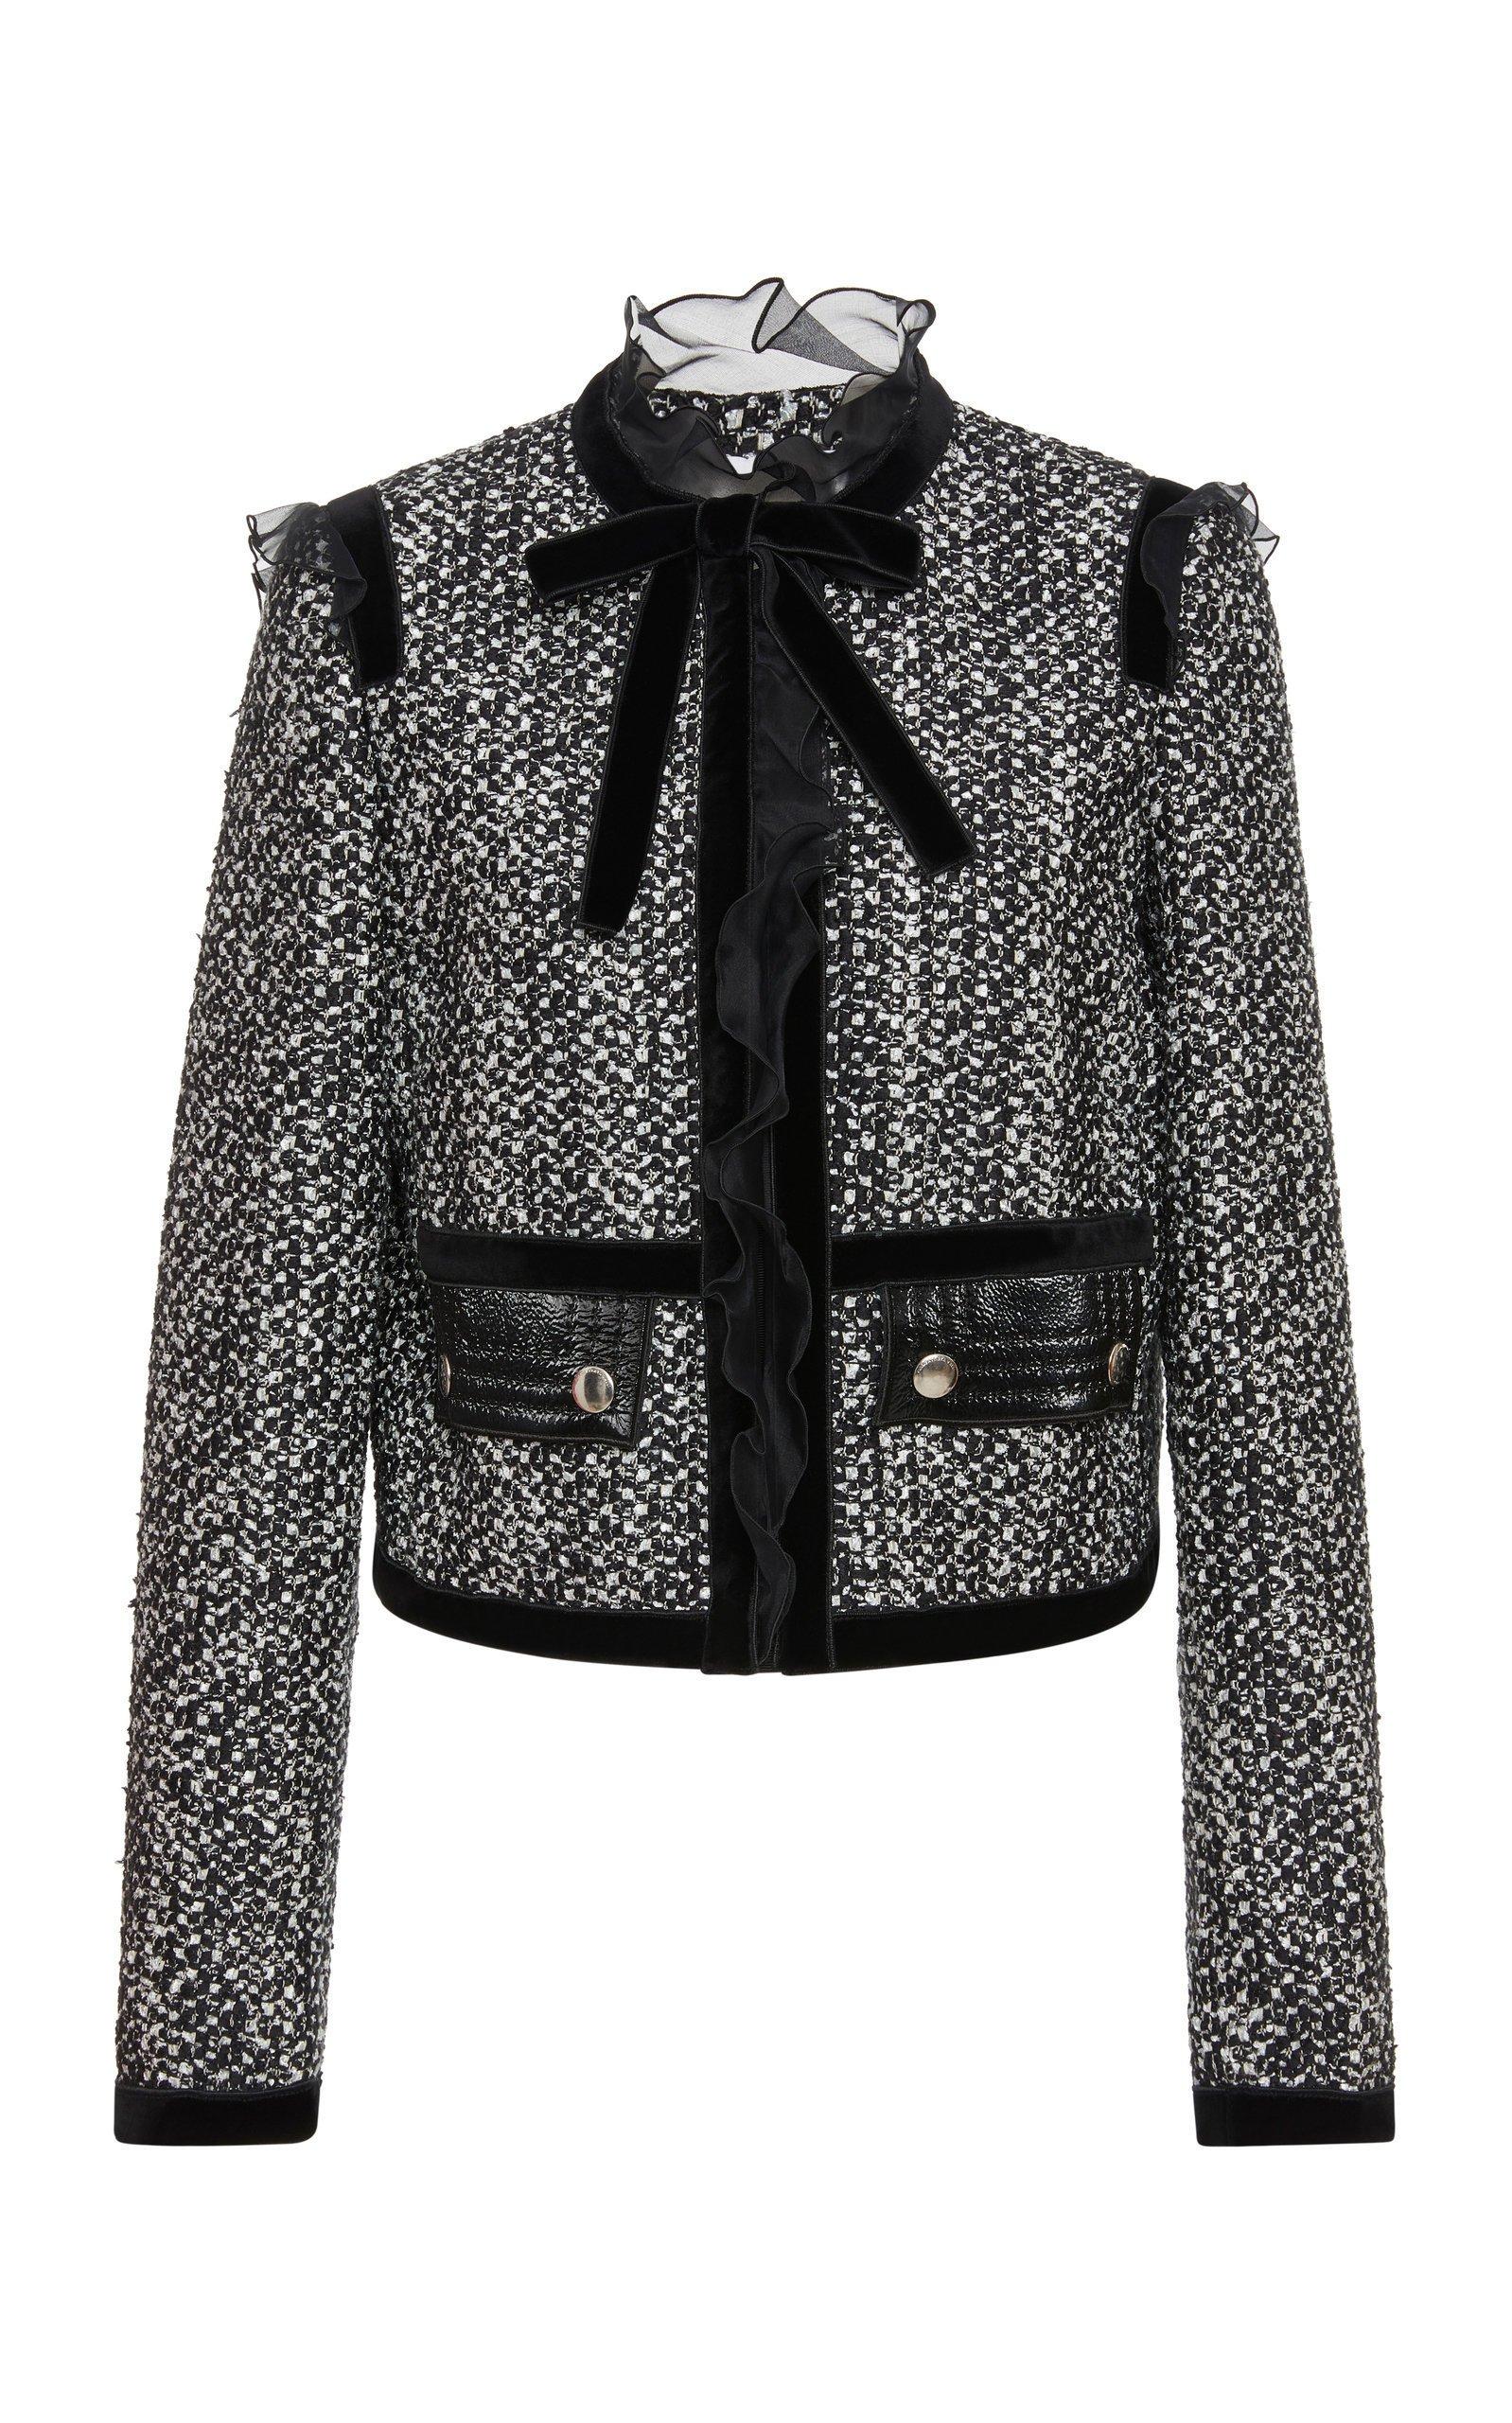 Ruffled Bow-Detailed Tweed Jacket by Giambattista Valli | Moda Operandi